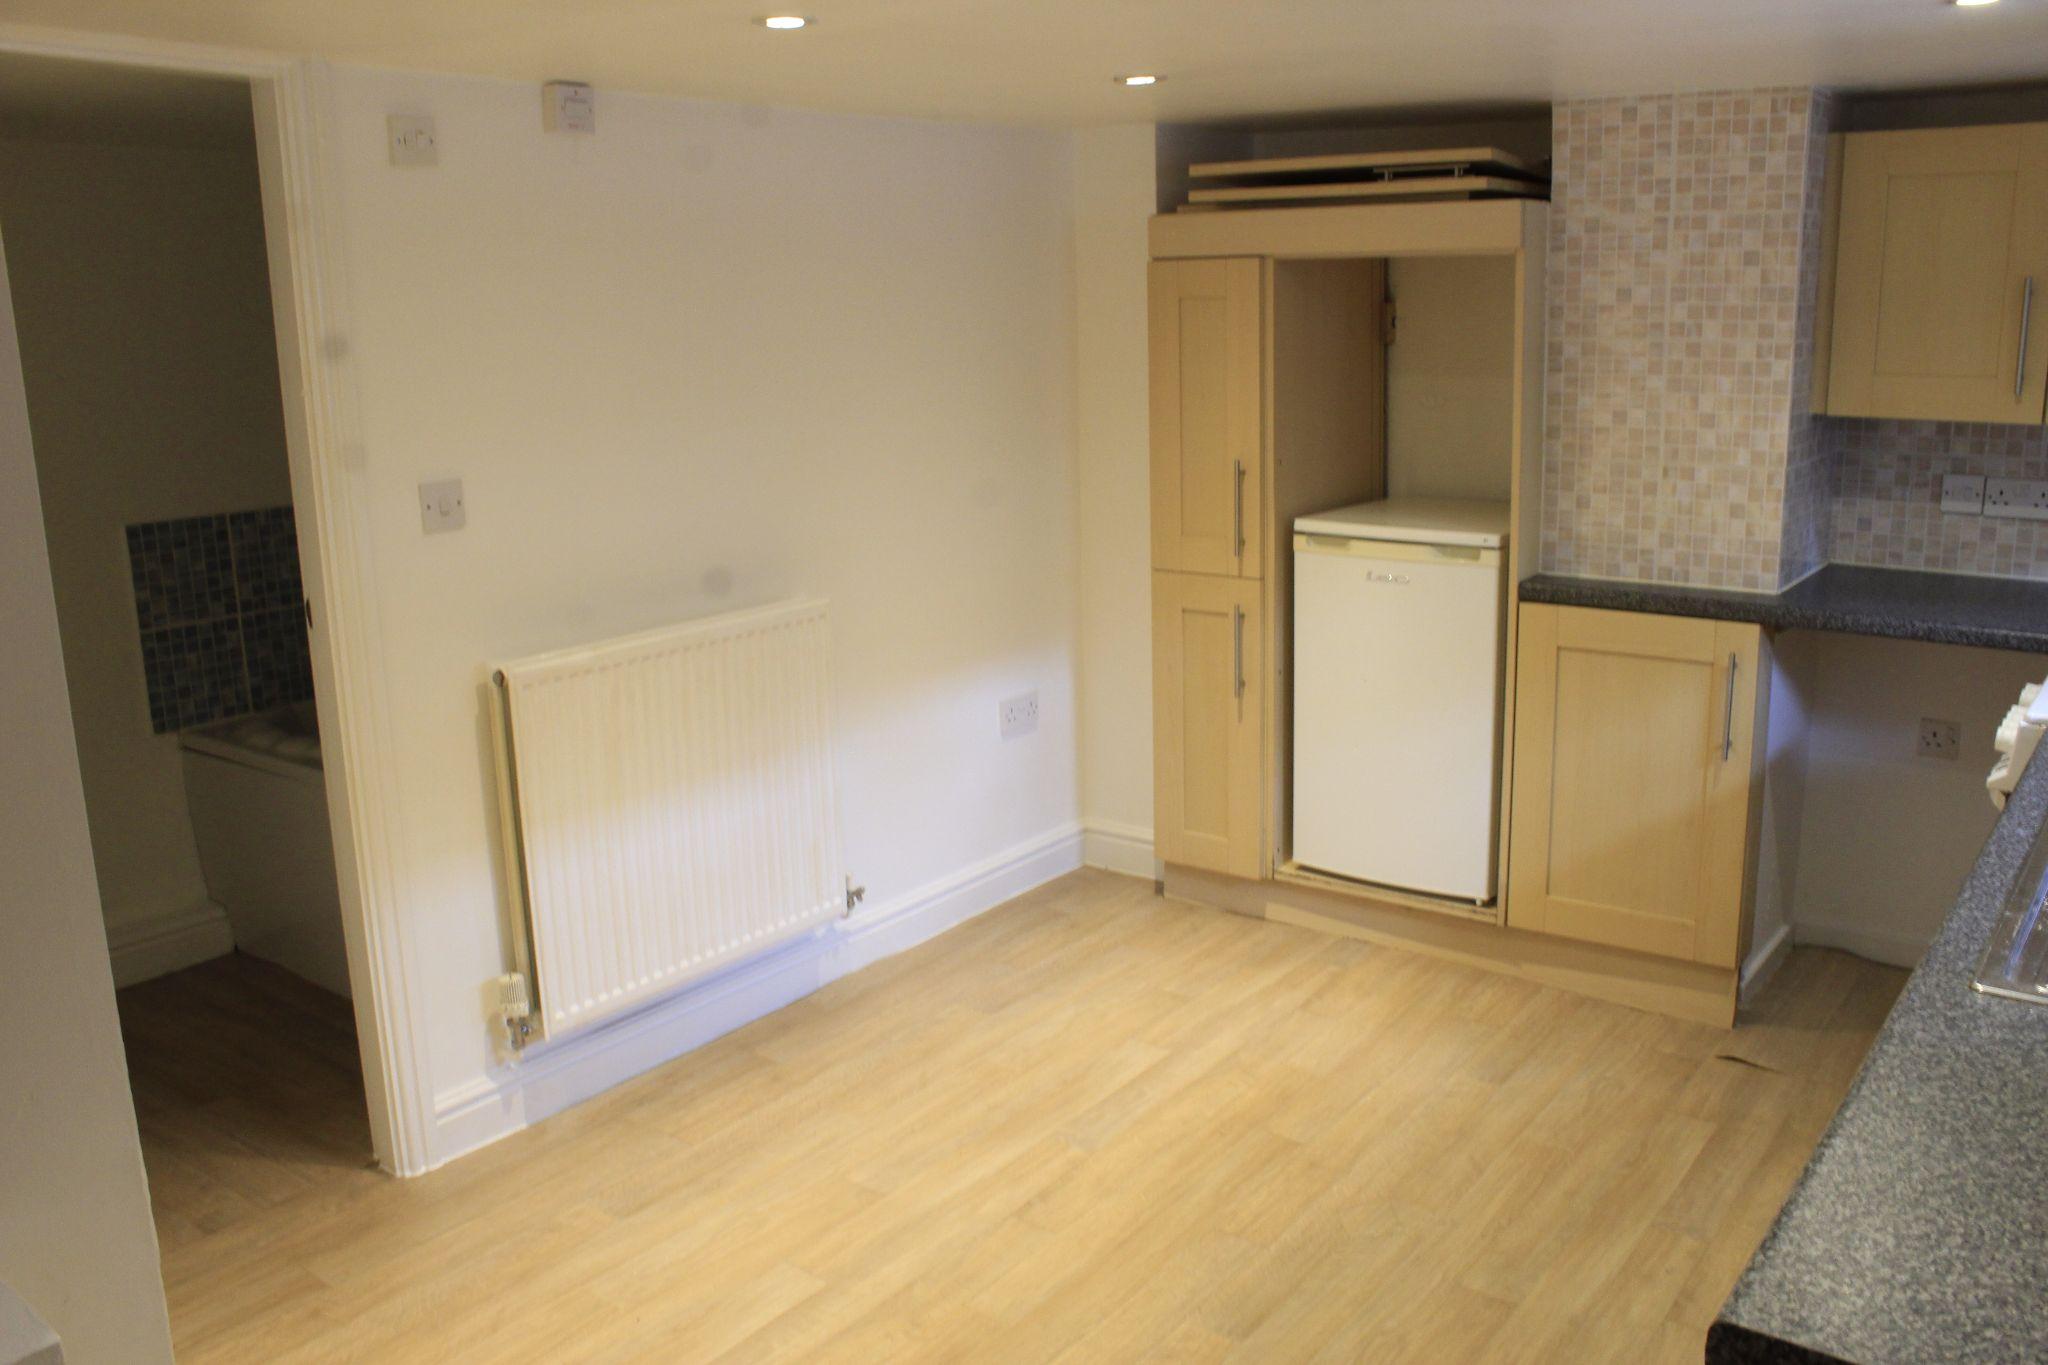 1 bedroom maisonette flat/apartment To Let in Huddersfield - Kitchen / Diner